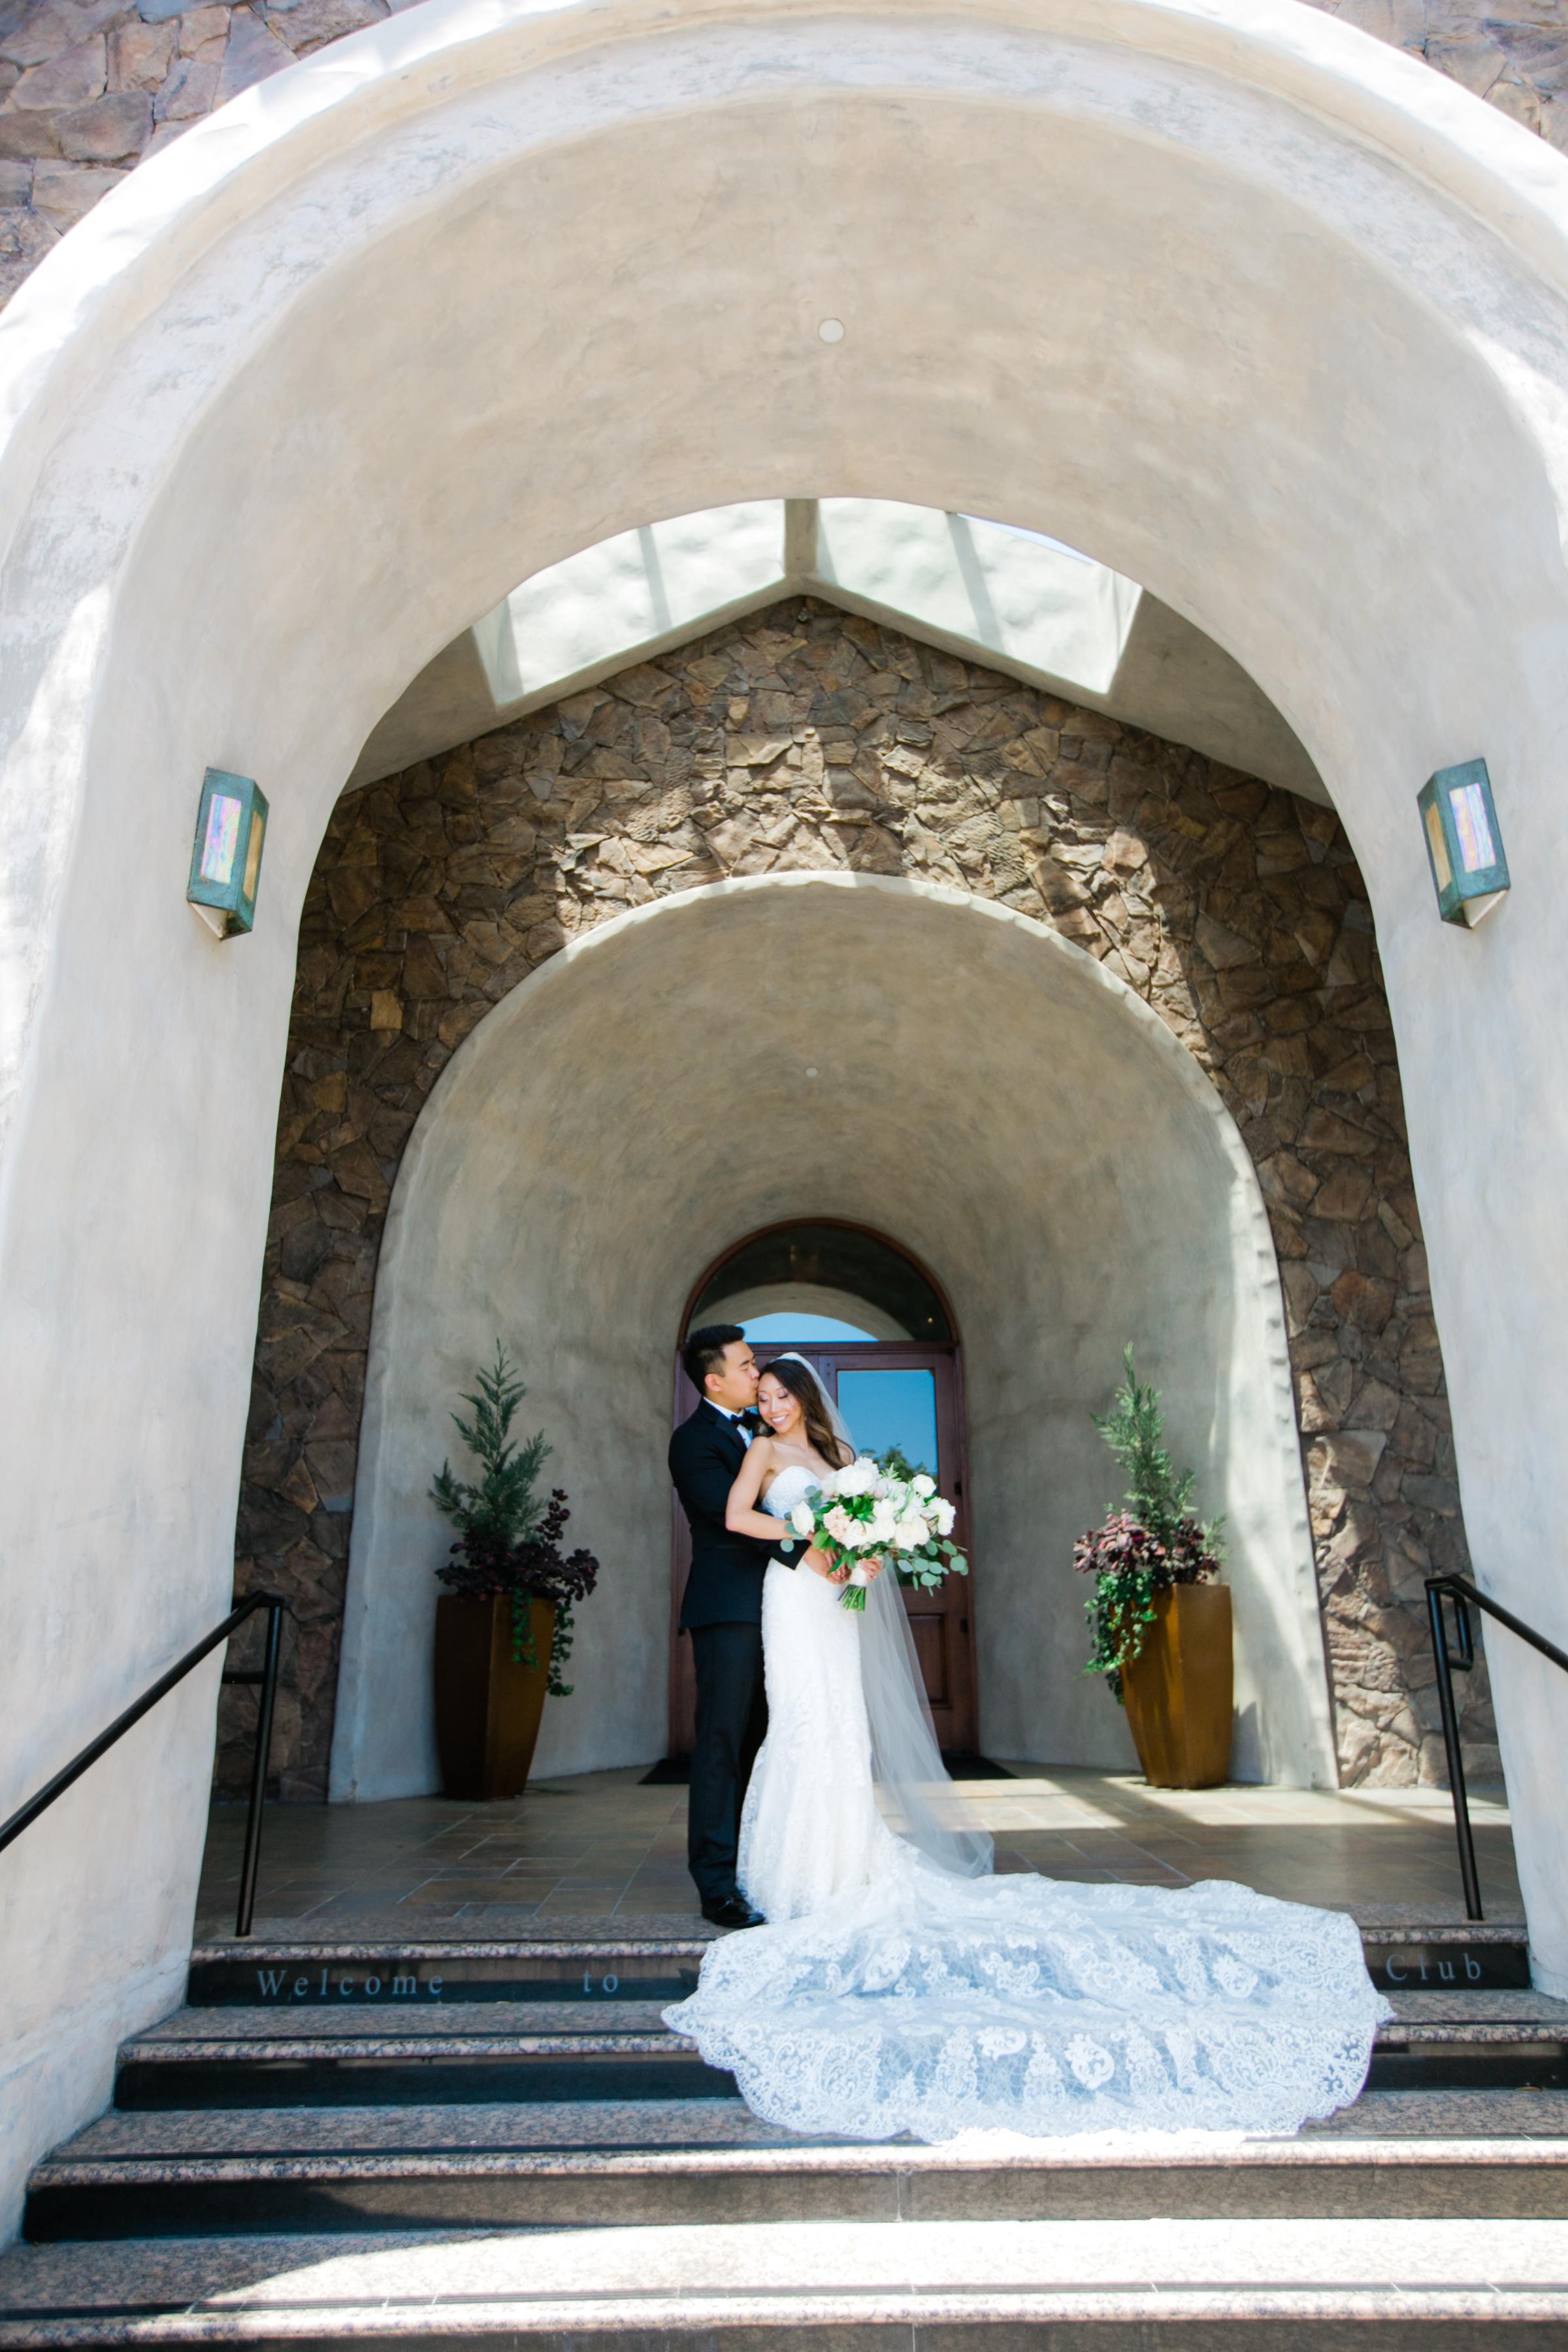 Seal Beach wedding